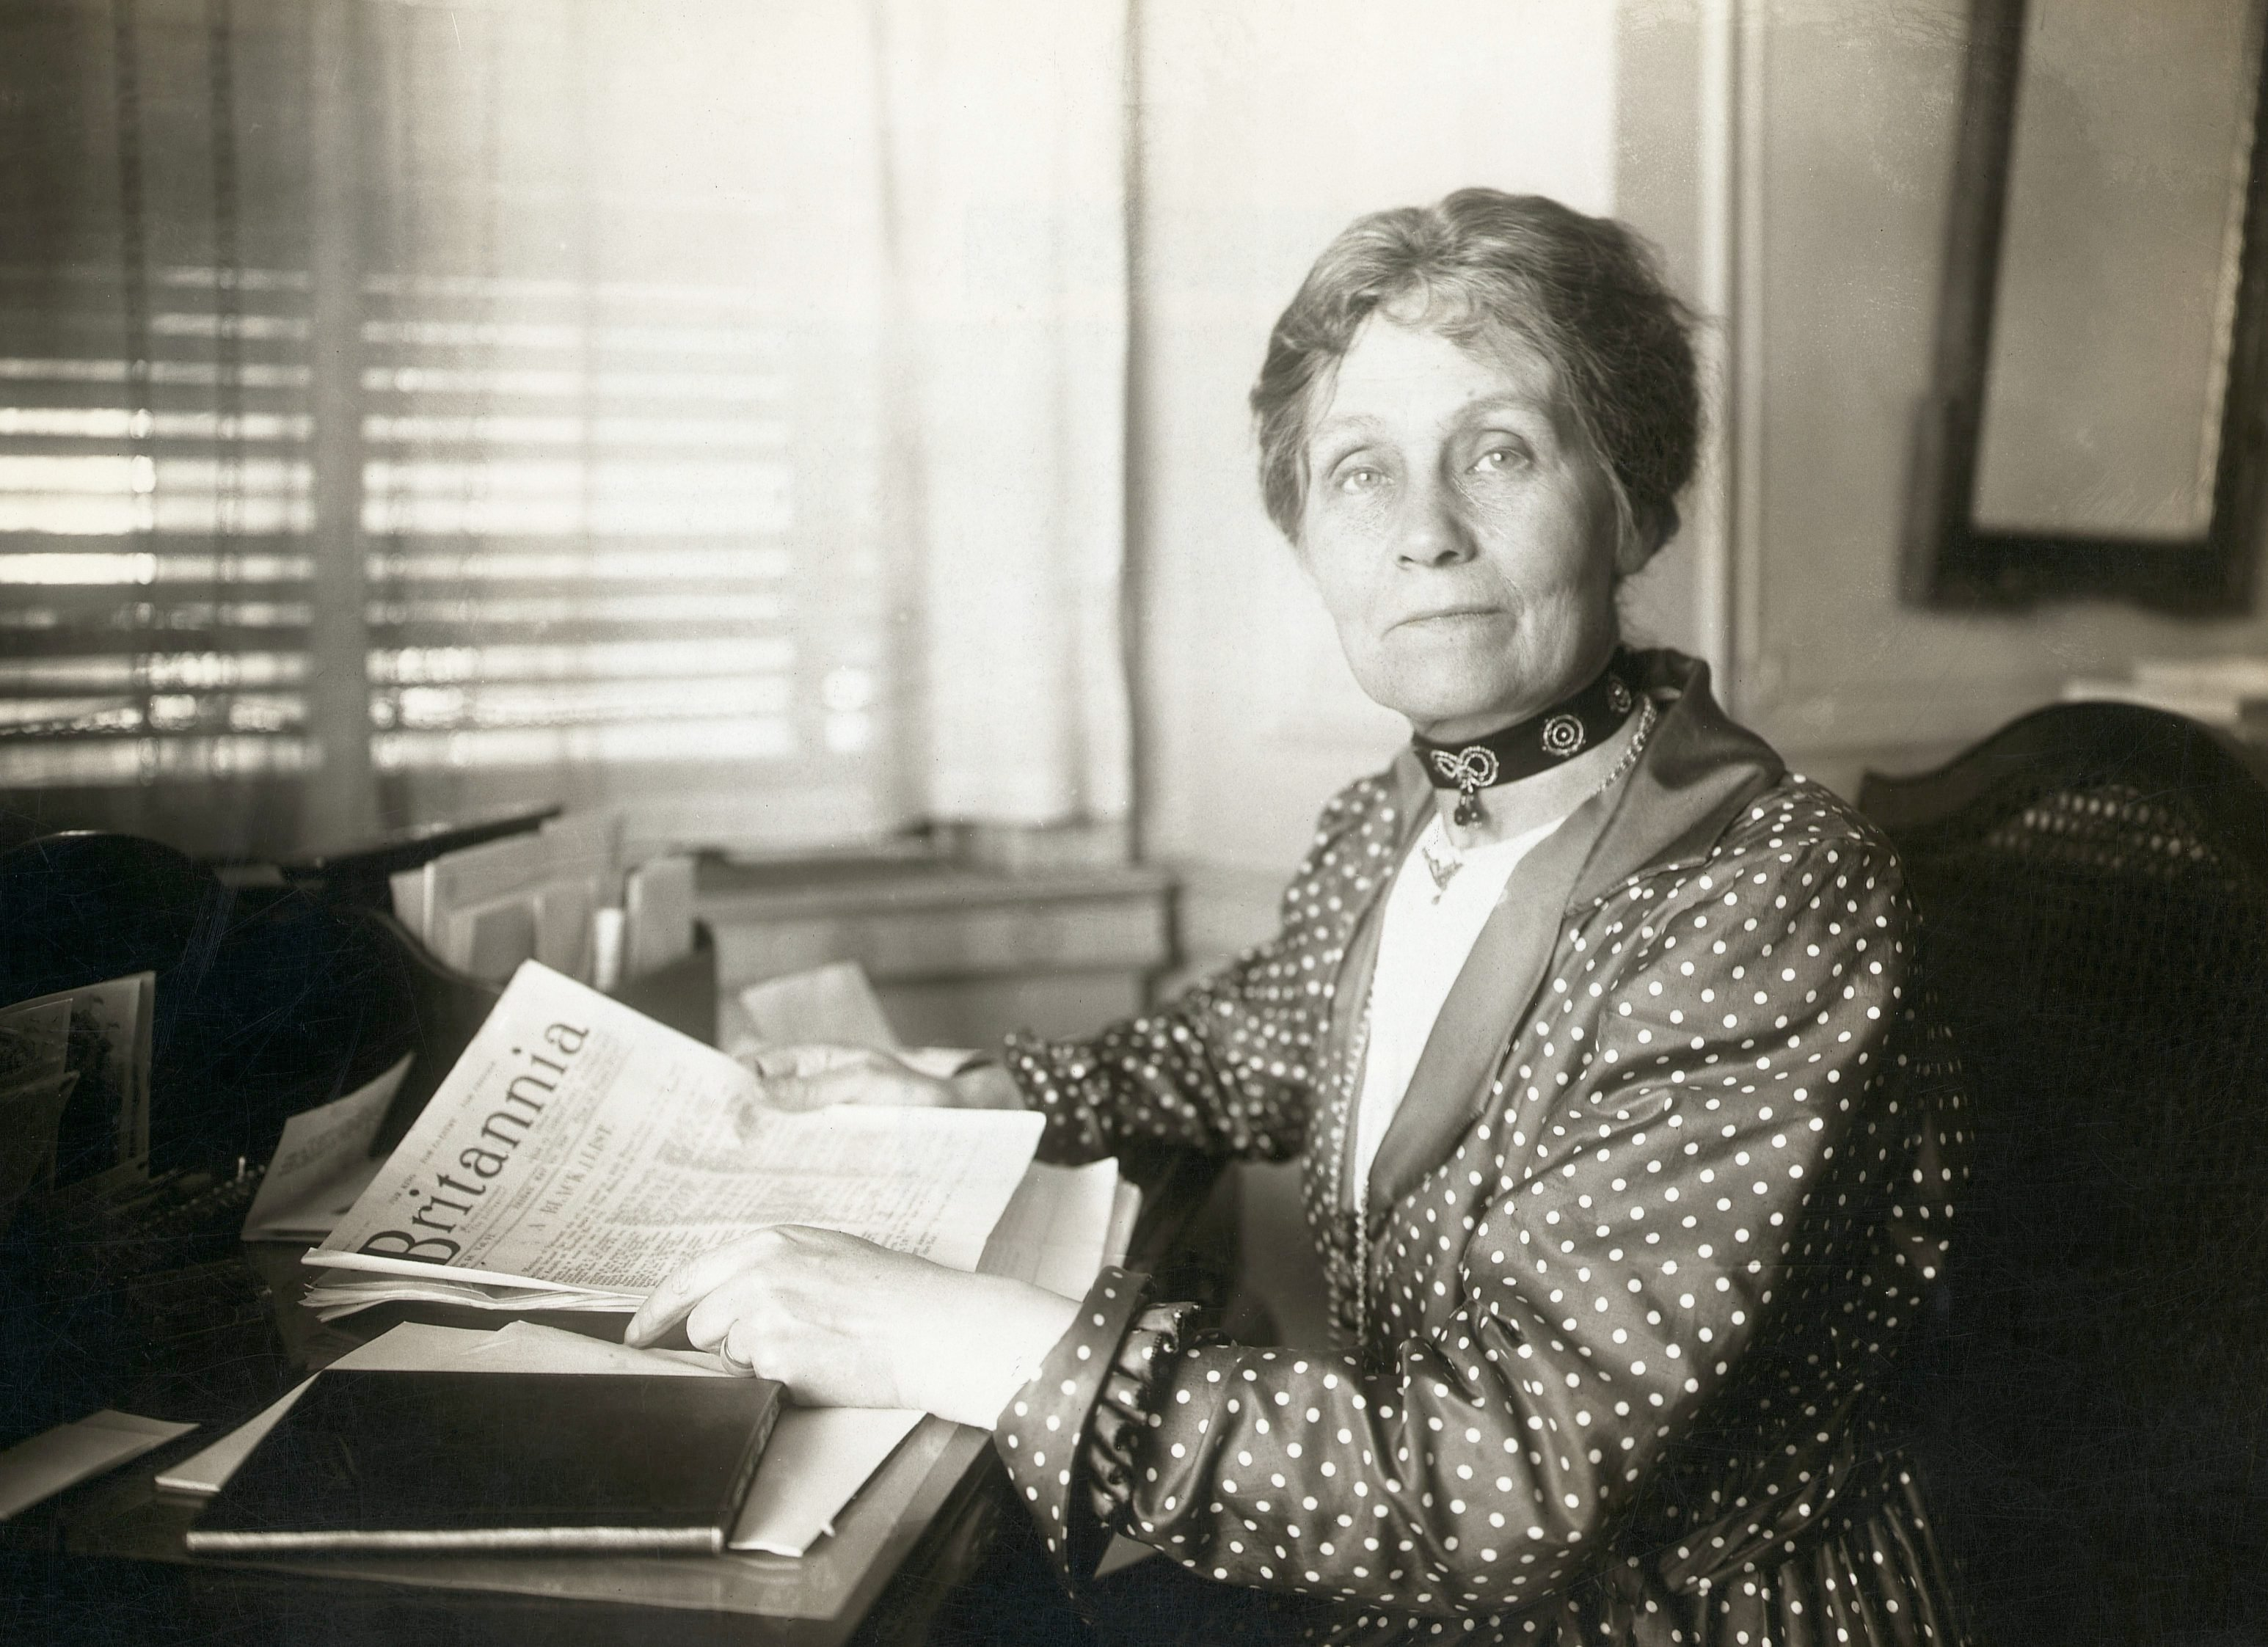 Emmeline Pankhurst Married Women's Property Act